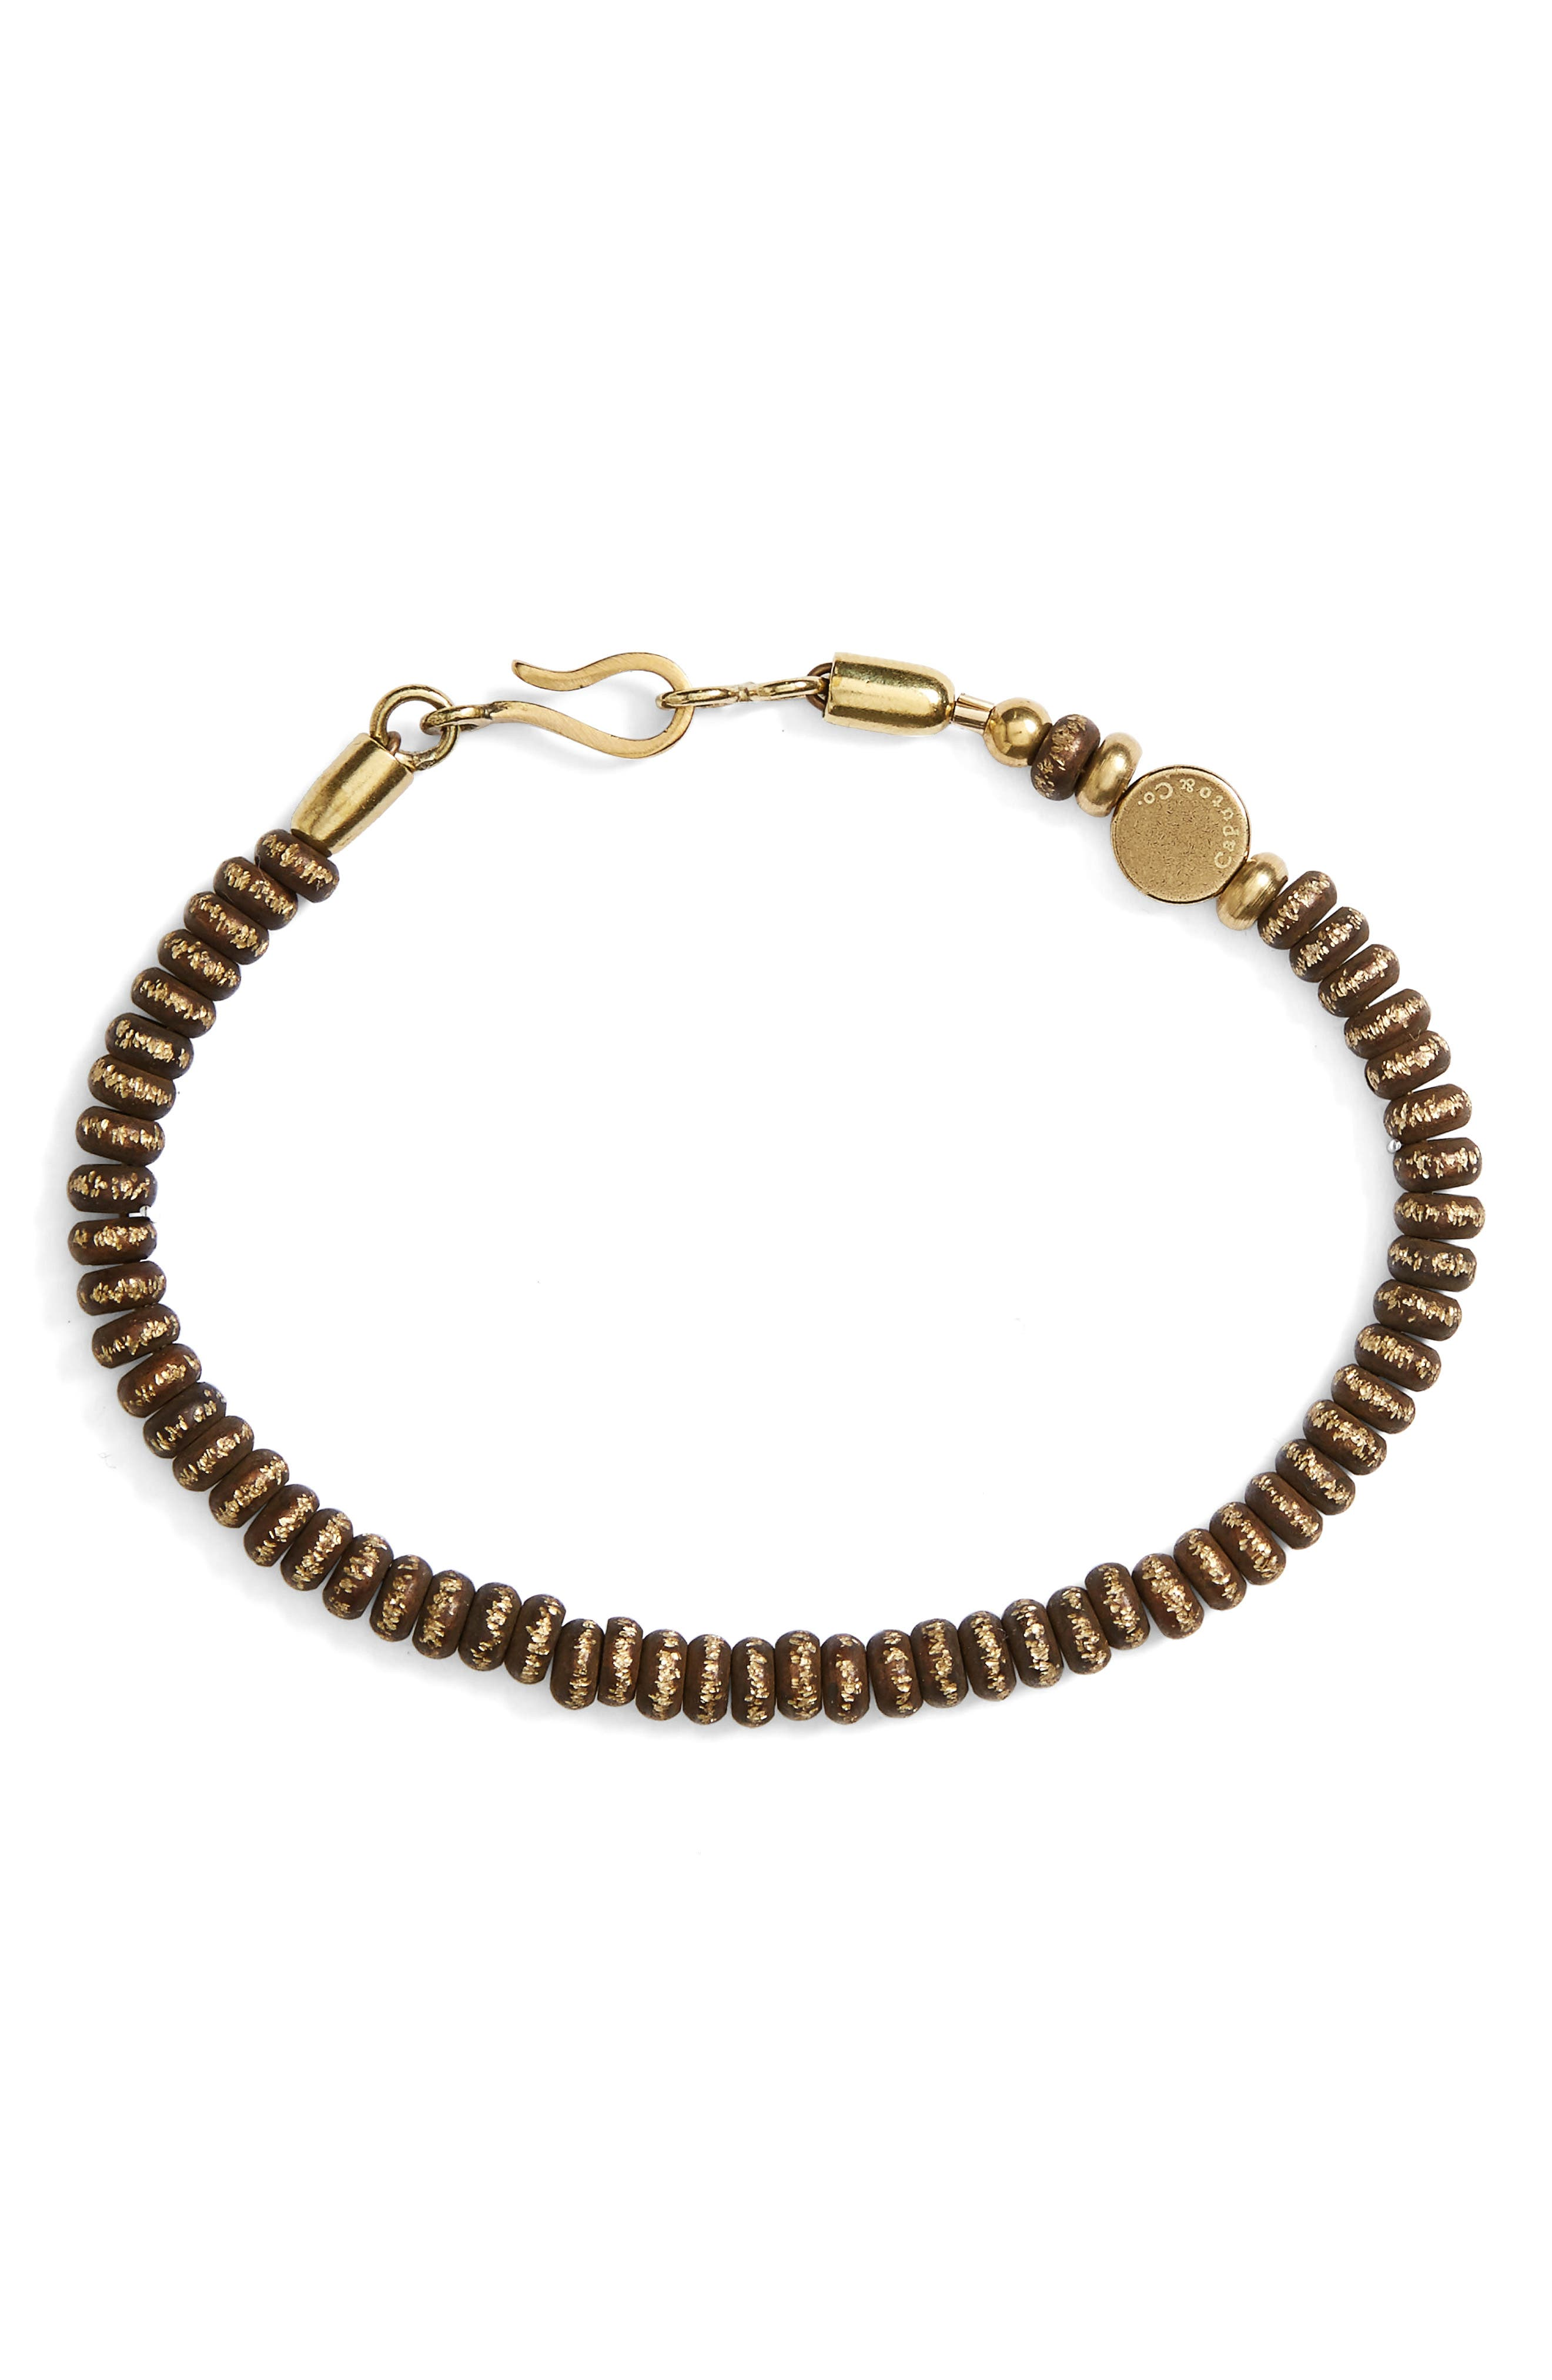 Rondelle Brass Bead Bracelet,                         Main,                         color, Brass